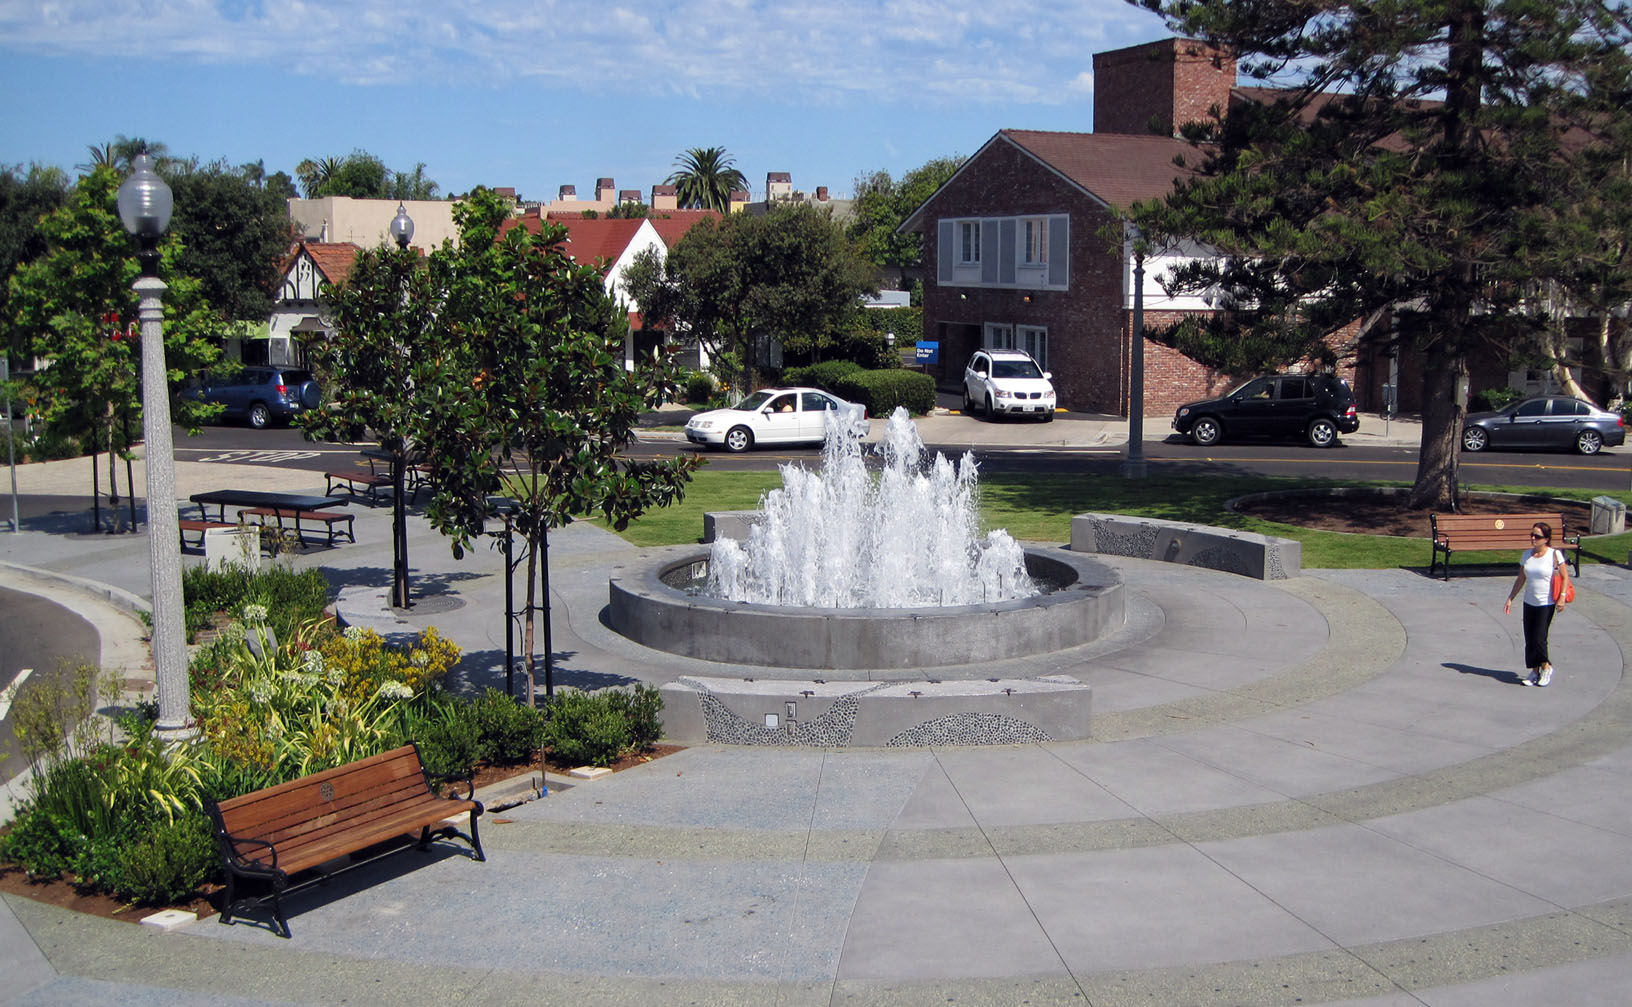 Coronado Rotary Plaza Street & Pedestrian Improvement, Coronado, California